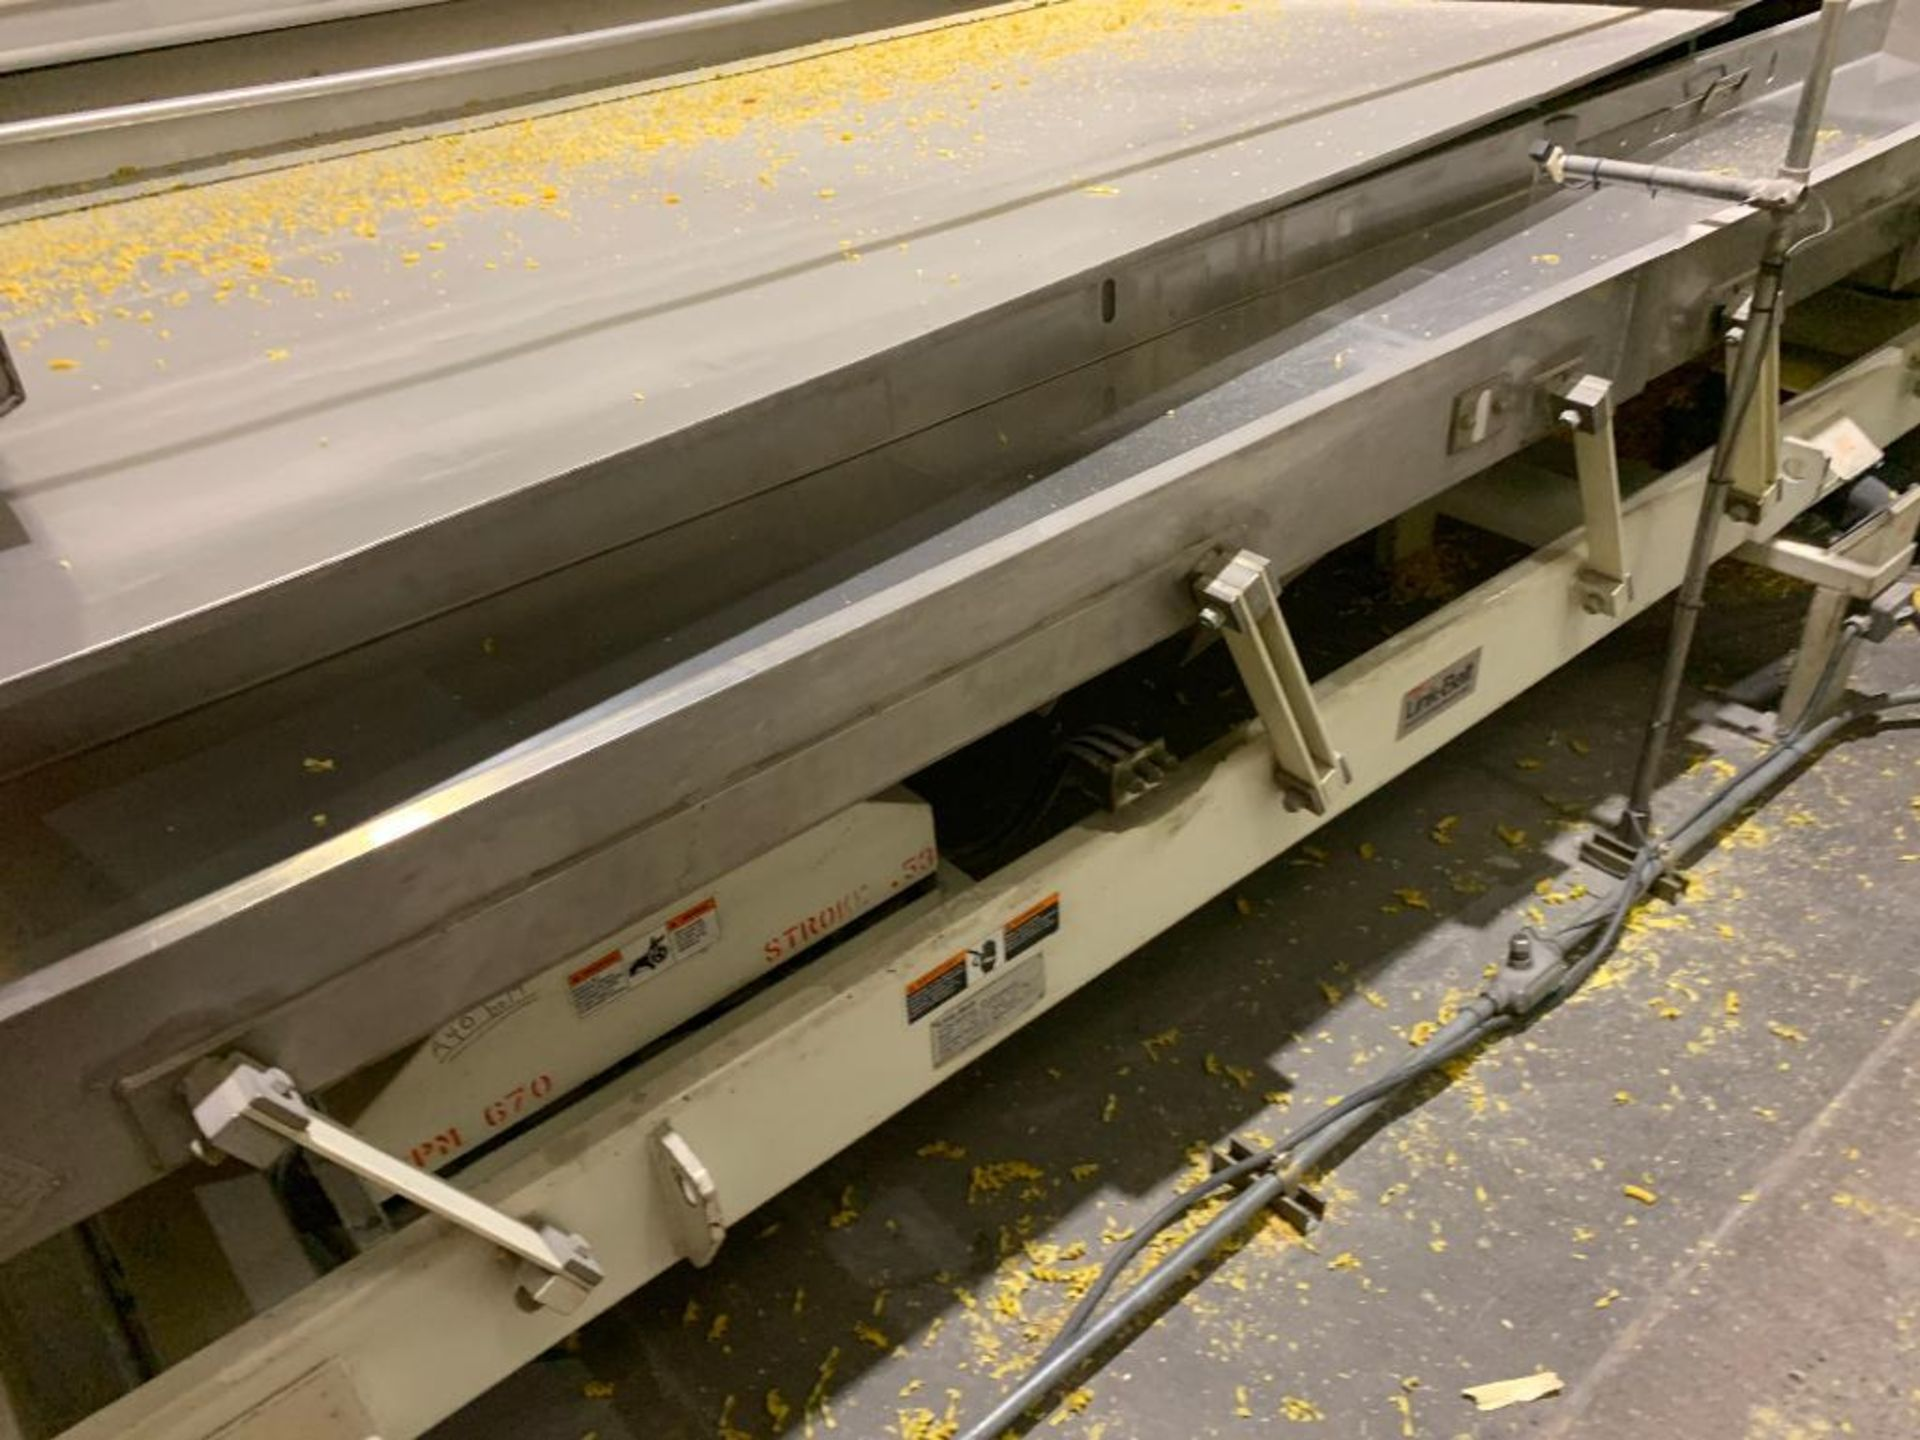 Link Belt vibratory conveyor - Image 4 of 5